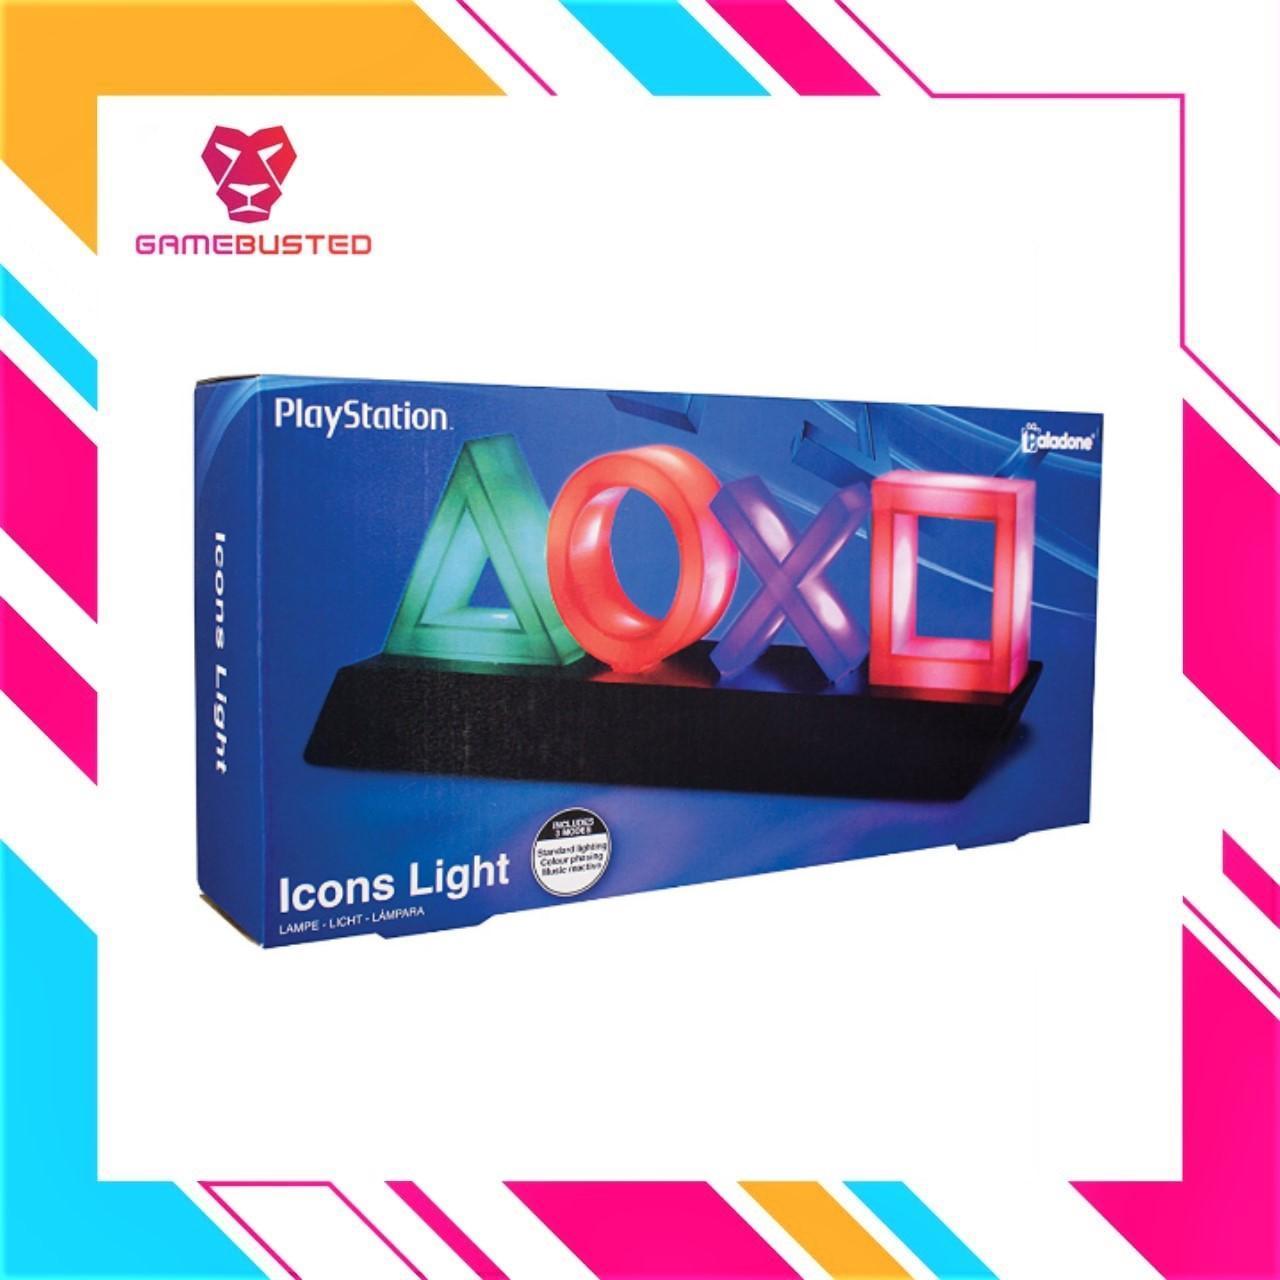 Playstation Icon Light – Paladone